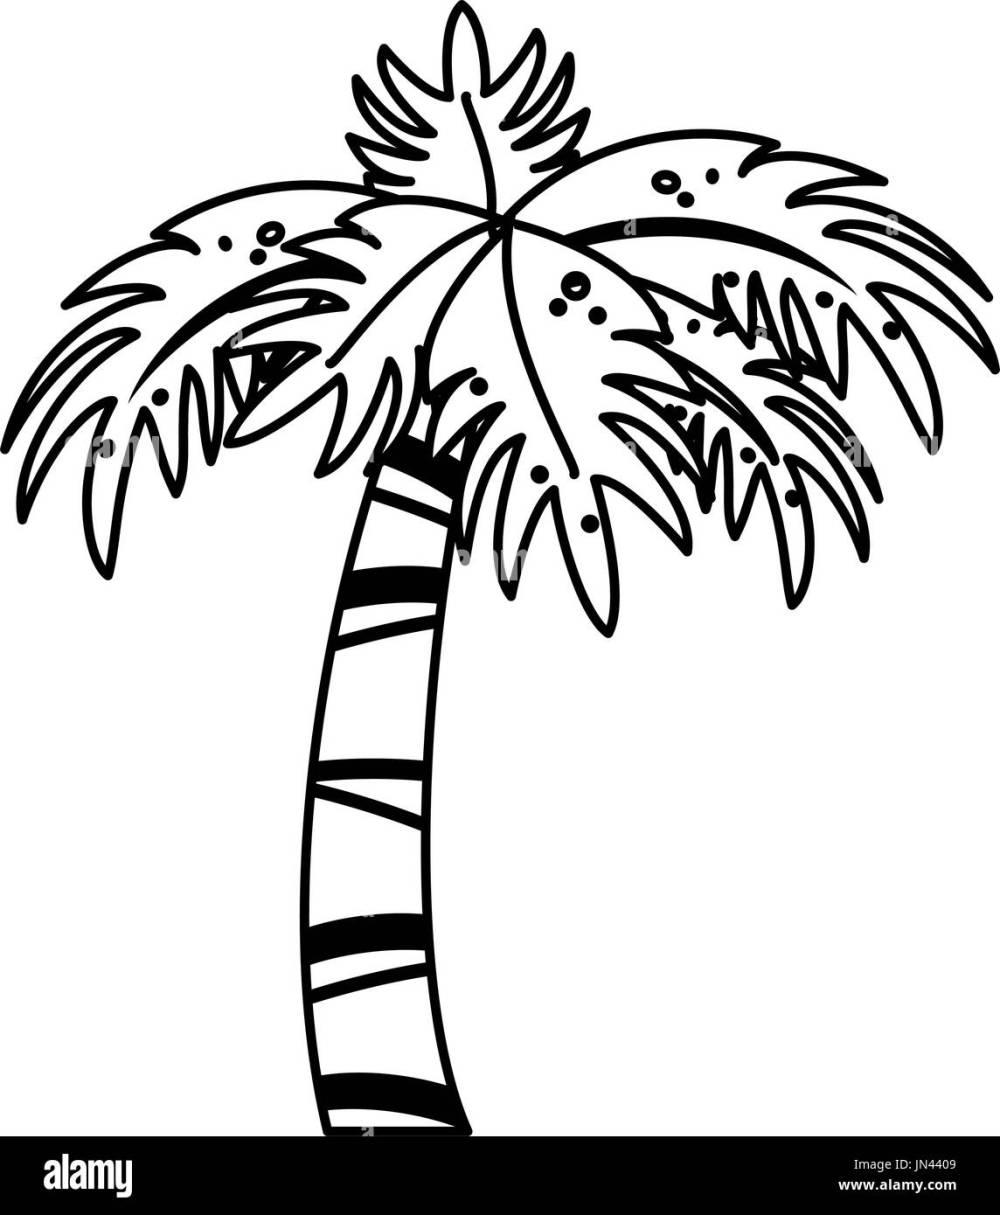 medium resolution of palm tree icon image stock image